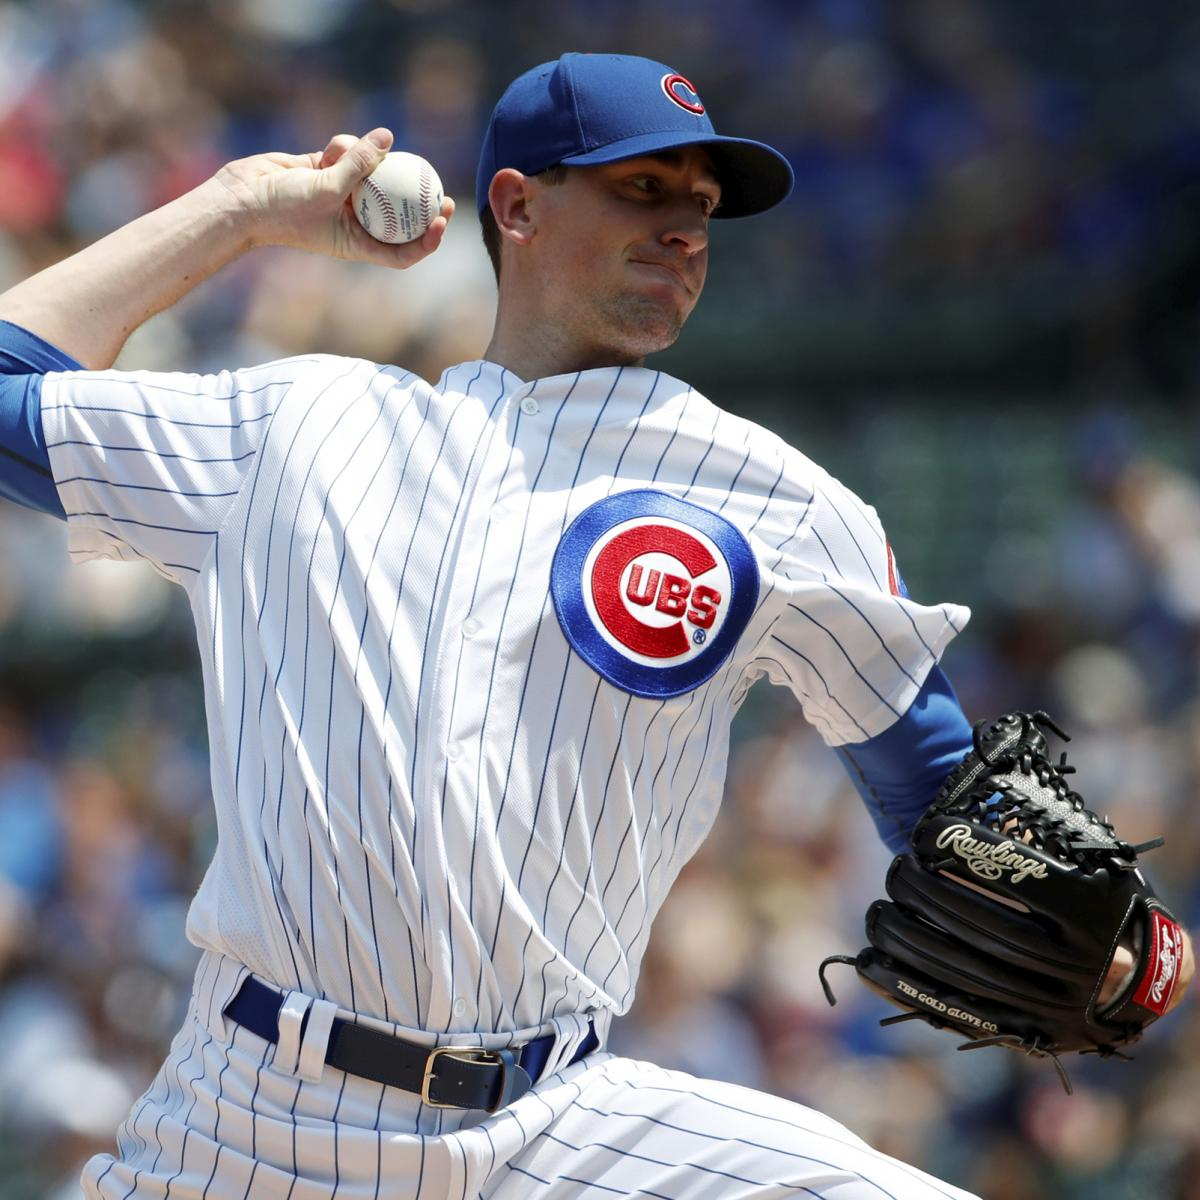 Washington Nationals vs. Chicago Cubs Odds, Analysis, MLB Betting Pick